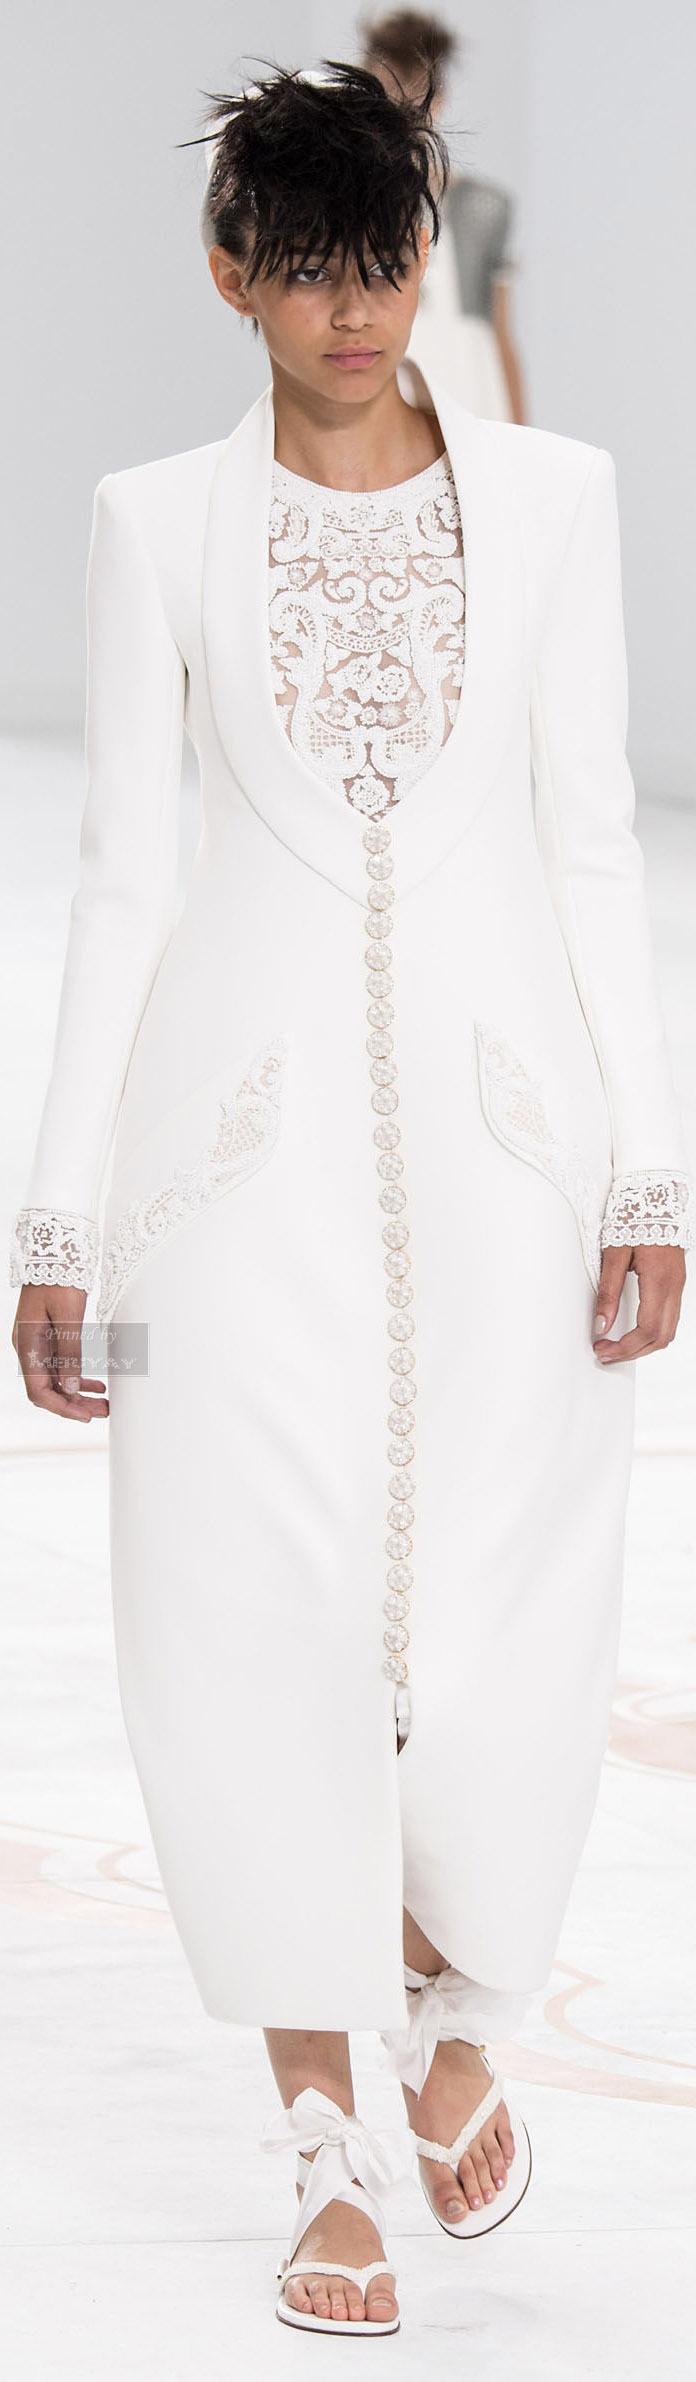 Chanel Fall-winter 2014-2015.